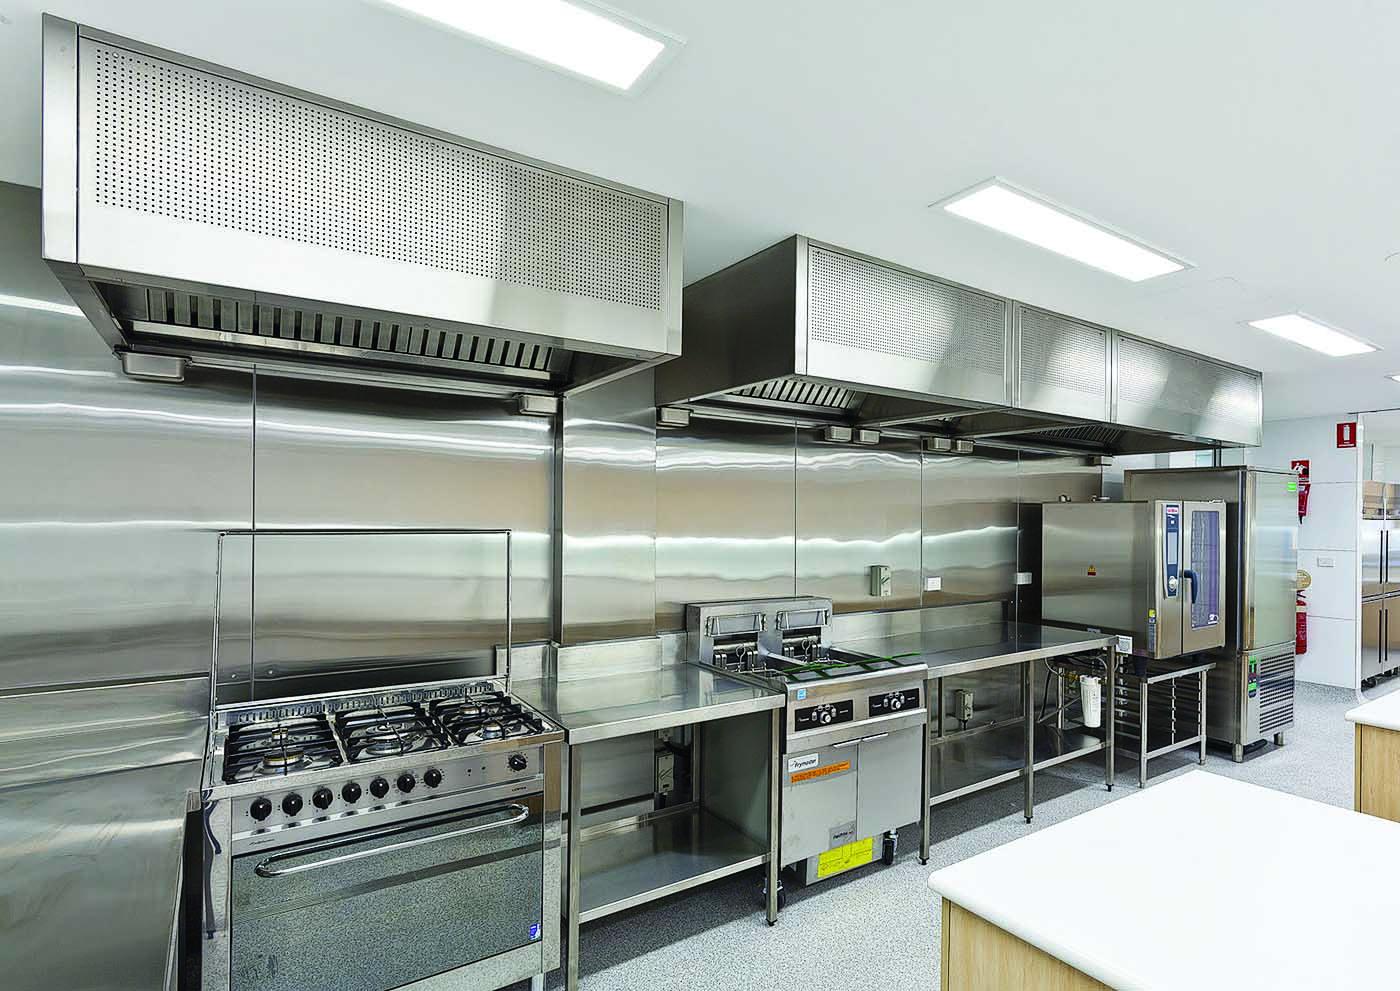 full commercial kitchen ventilation